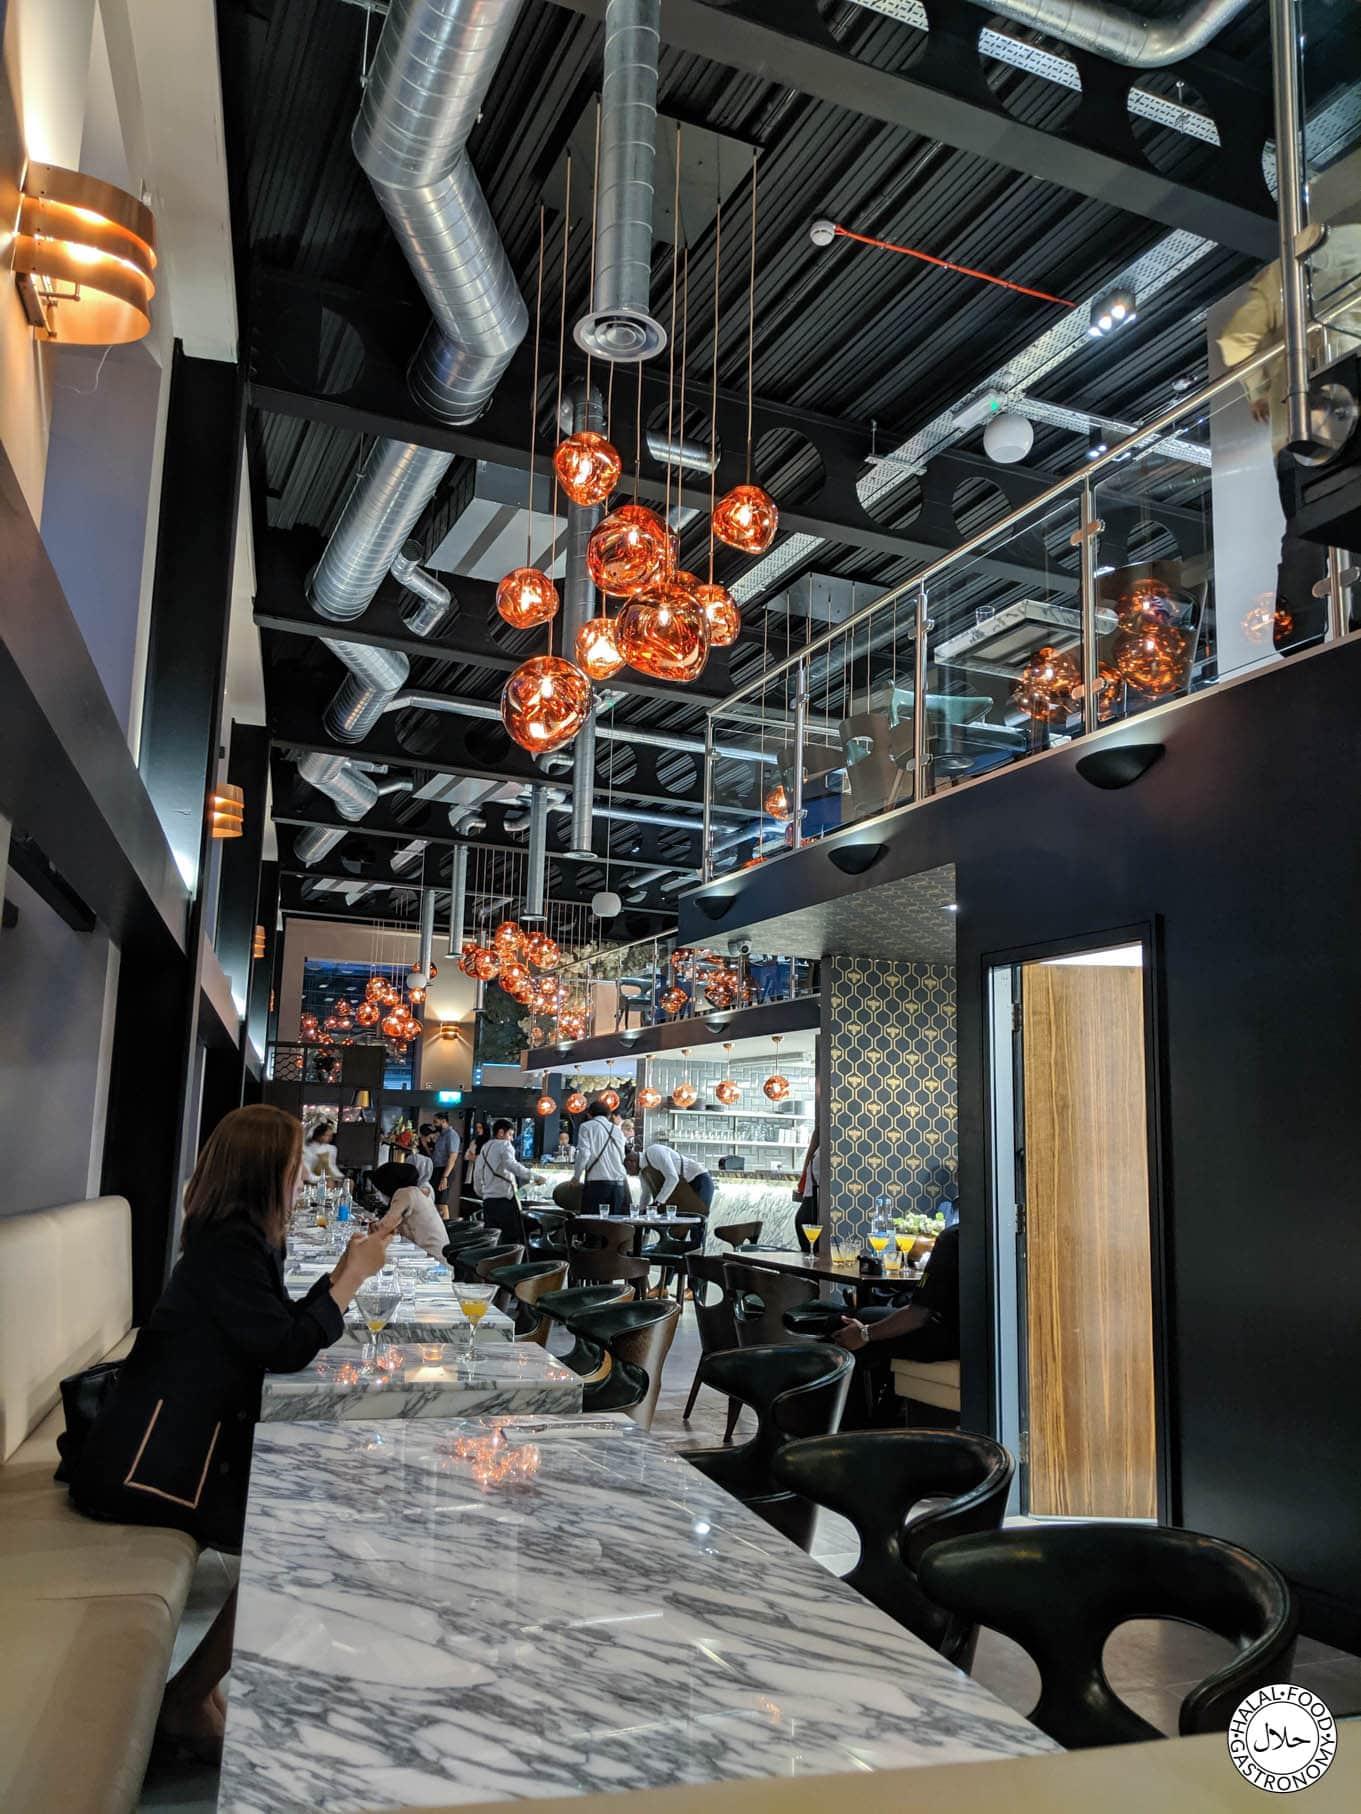 Ribeye Steakhouse Manchester